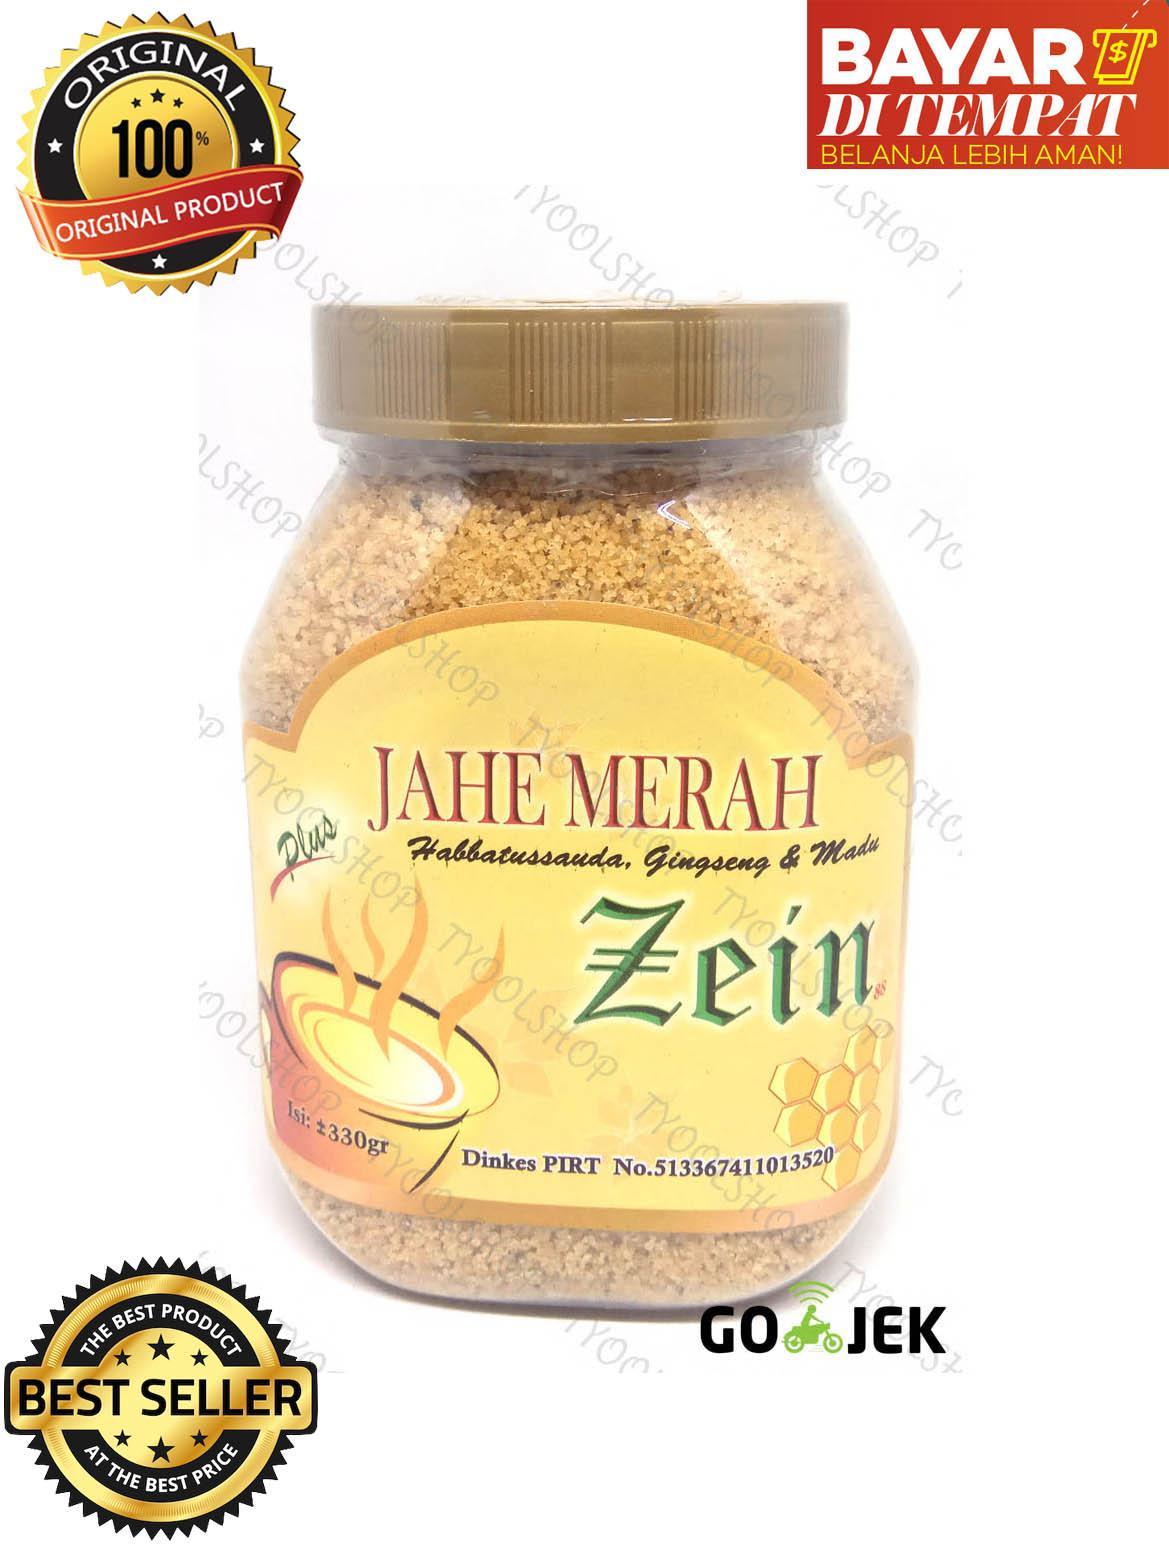 JAHE MERAH ZEIN plus habbatussauda madu dan ginseng - 330 gr